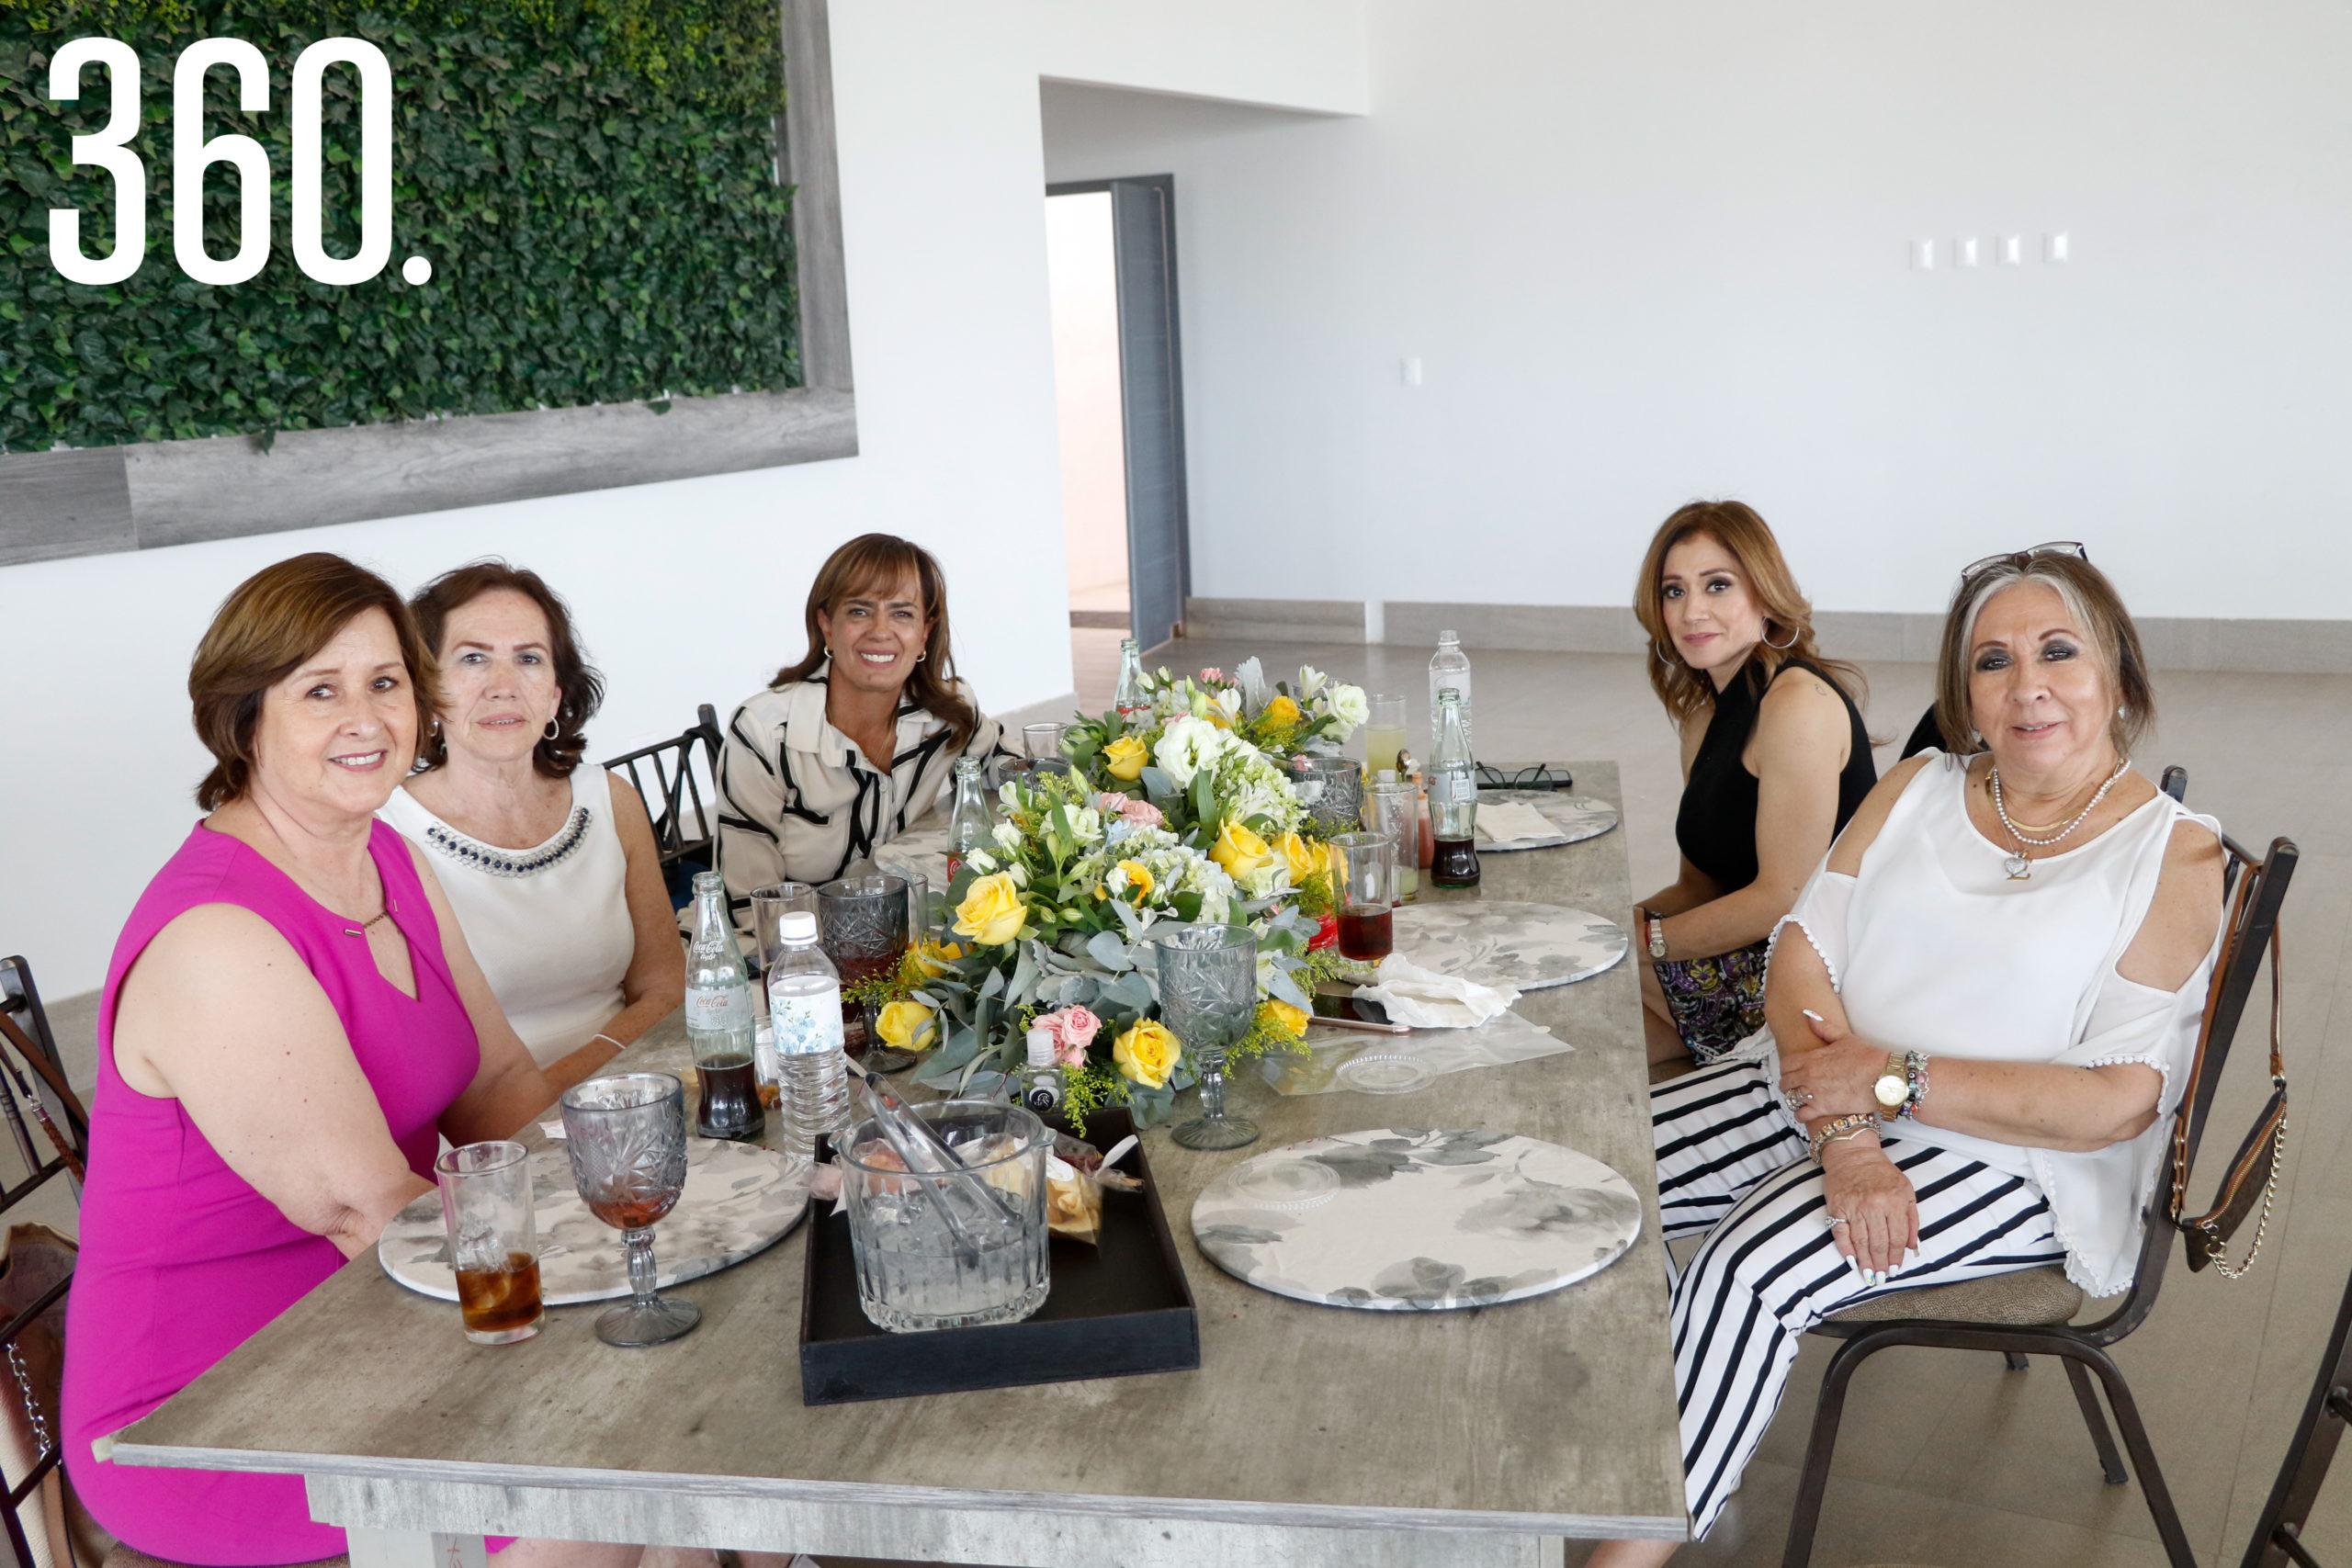 Carmen Gutiérrez, Irene Ewald, Patricia Macías, Martha Torres y Elia Oliveras.